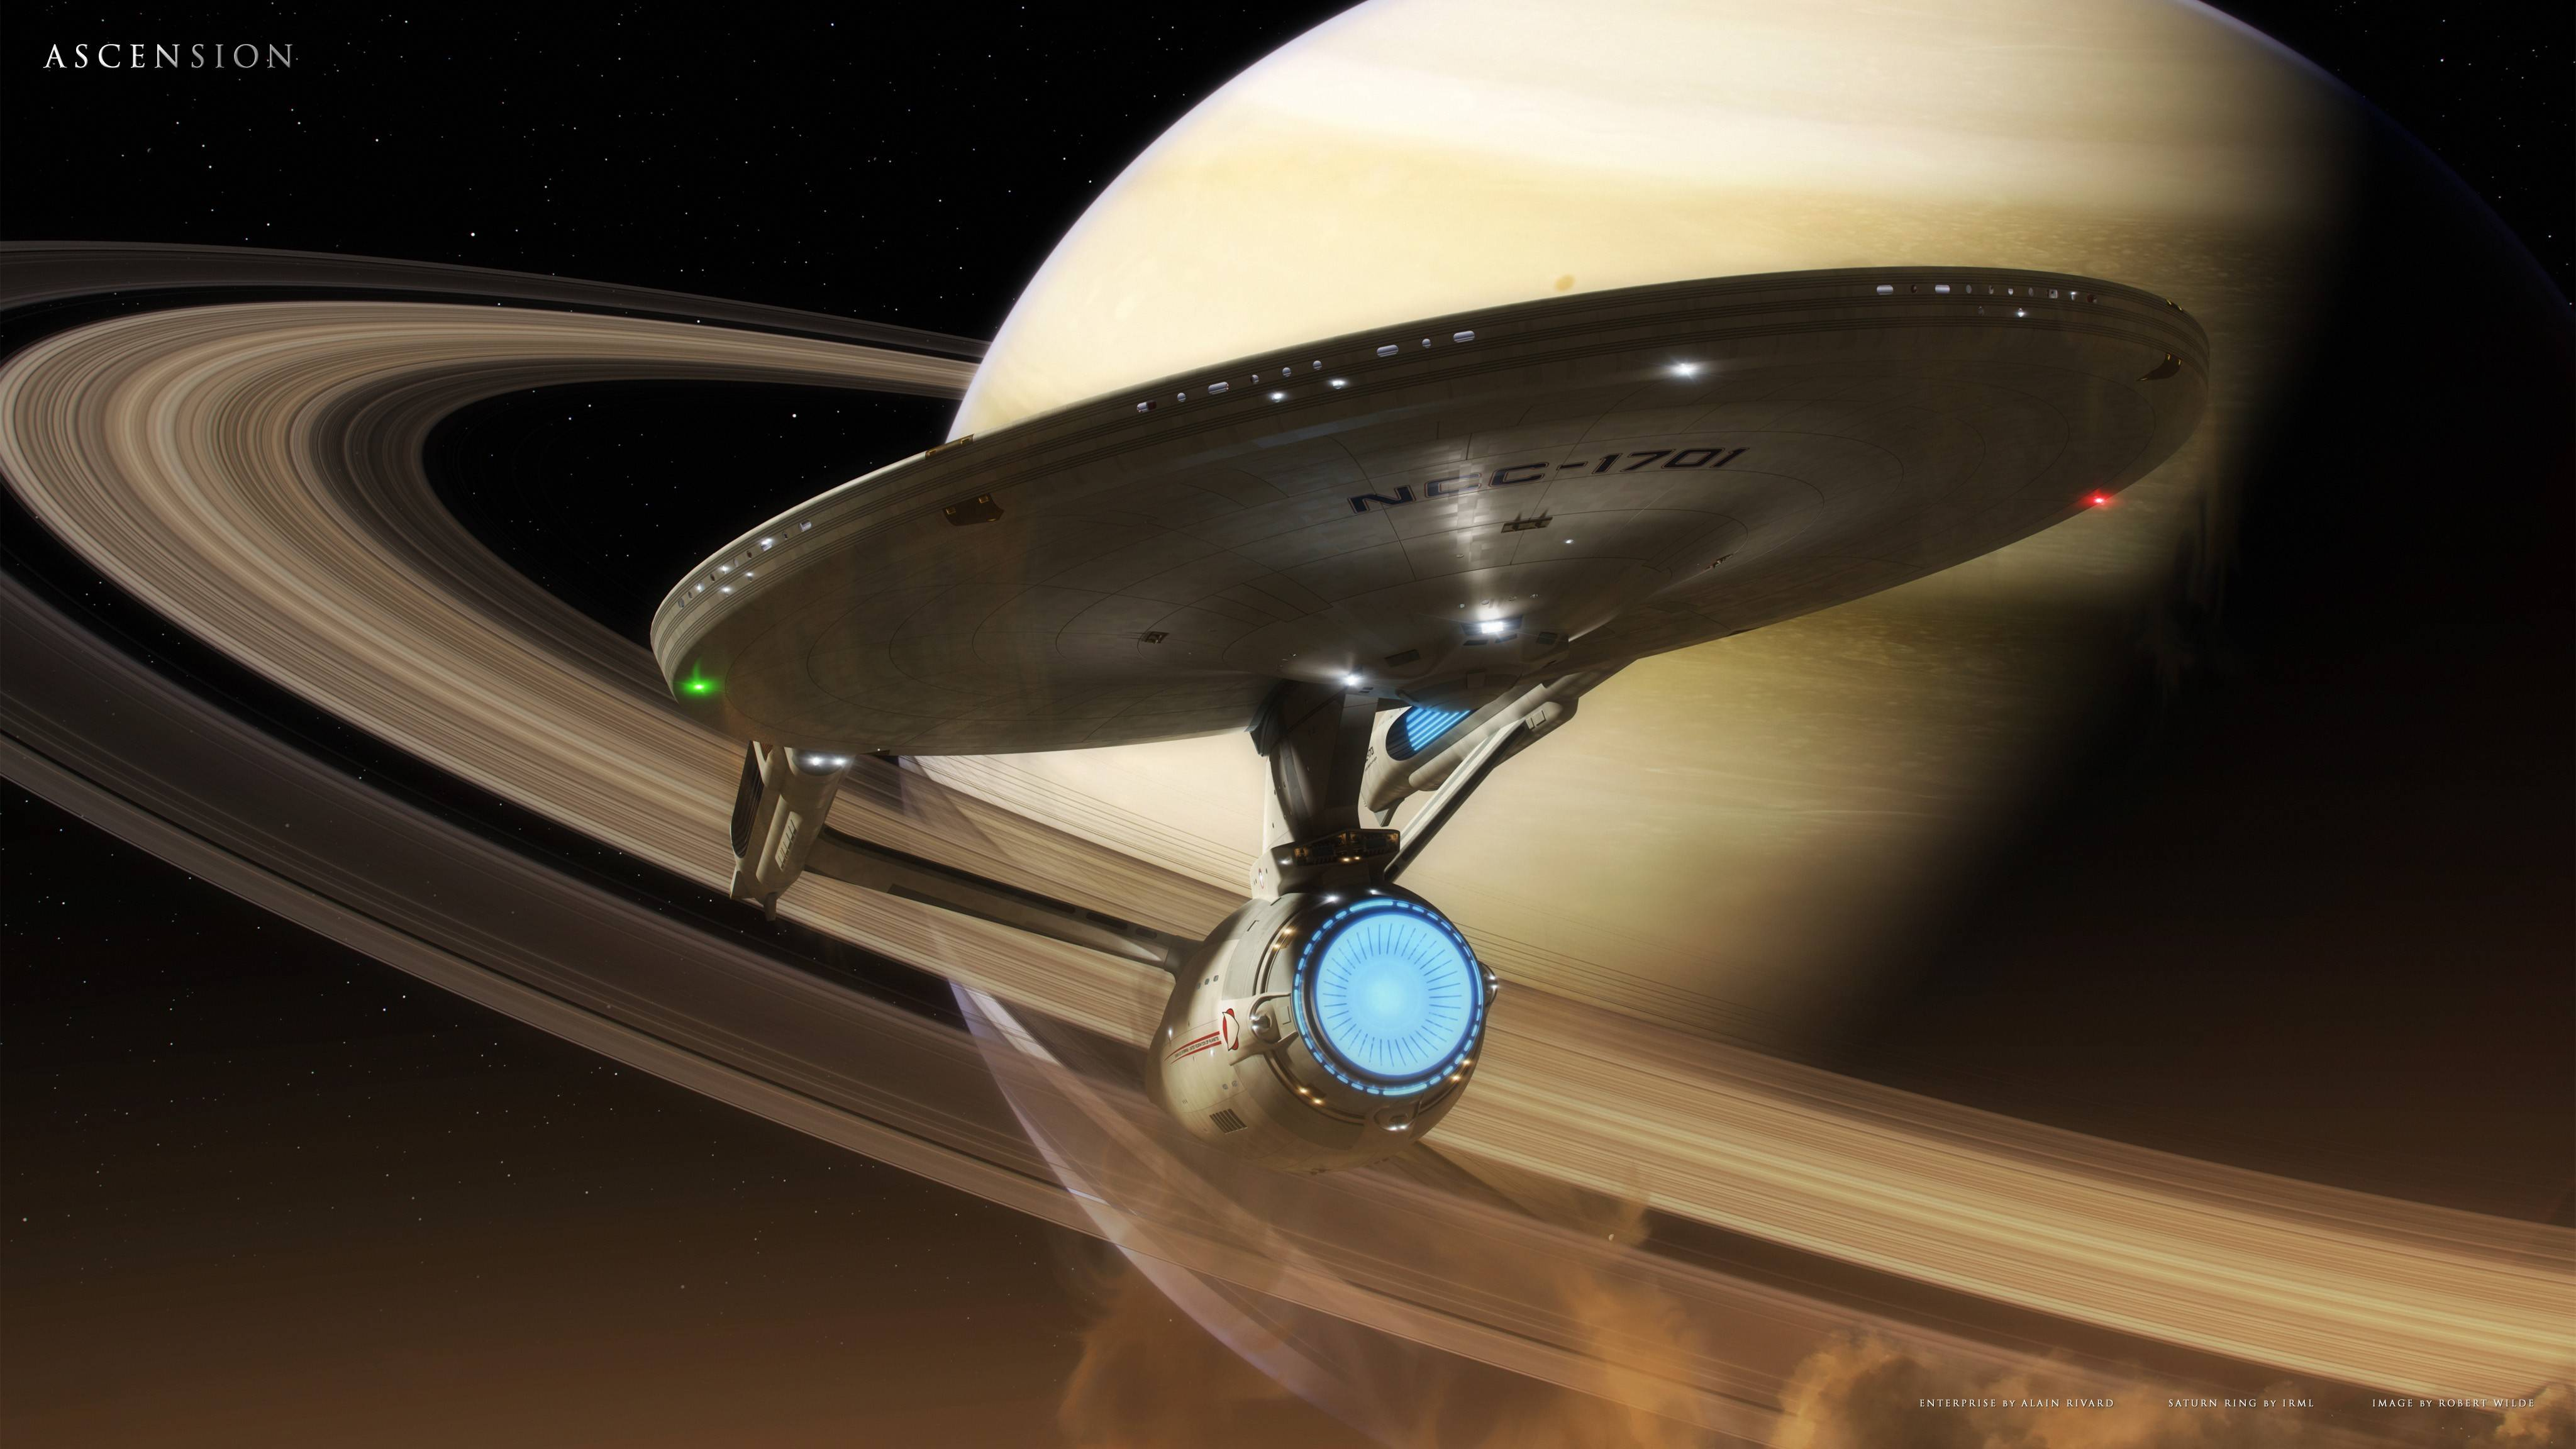 Star Trek Ships Wallpapers - Wallpaper Cave